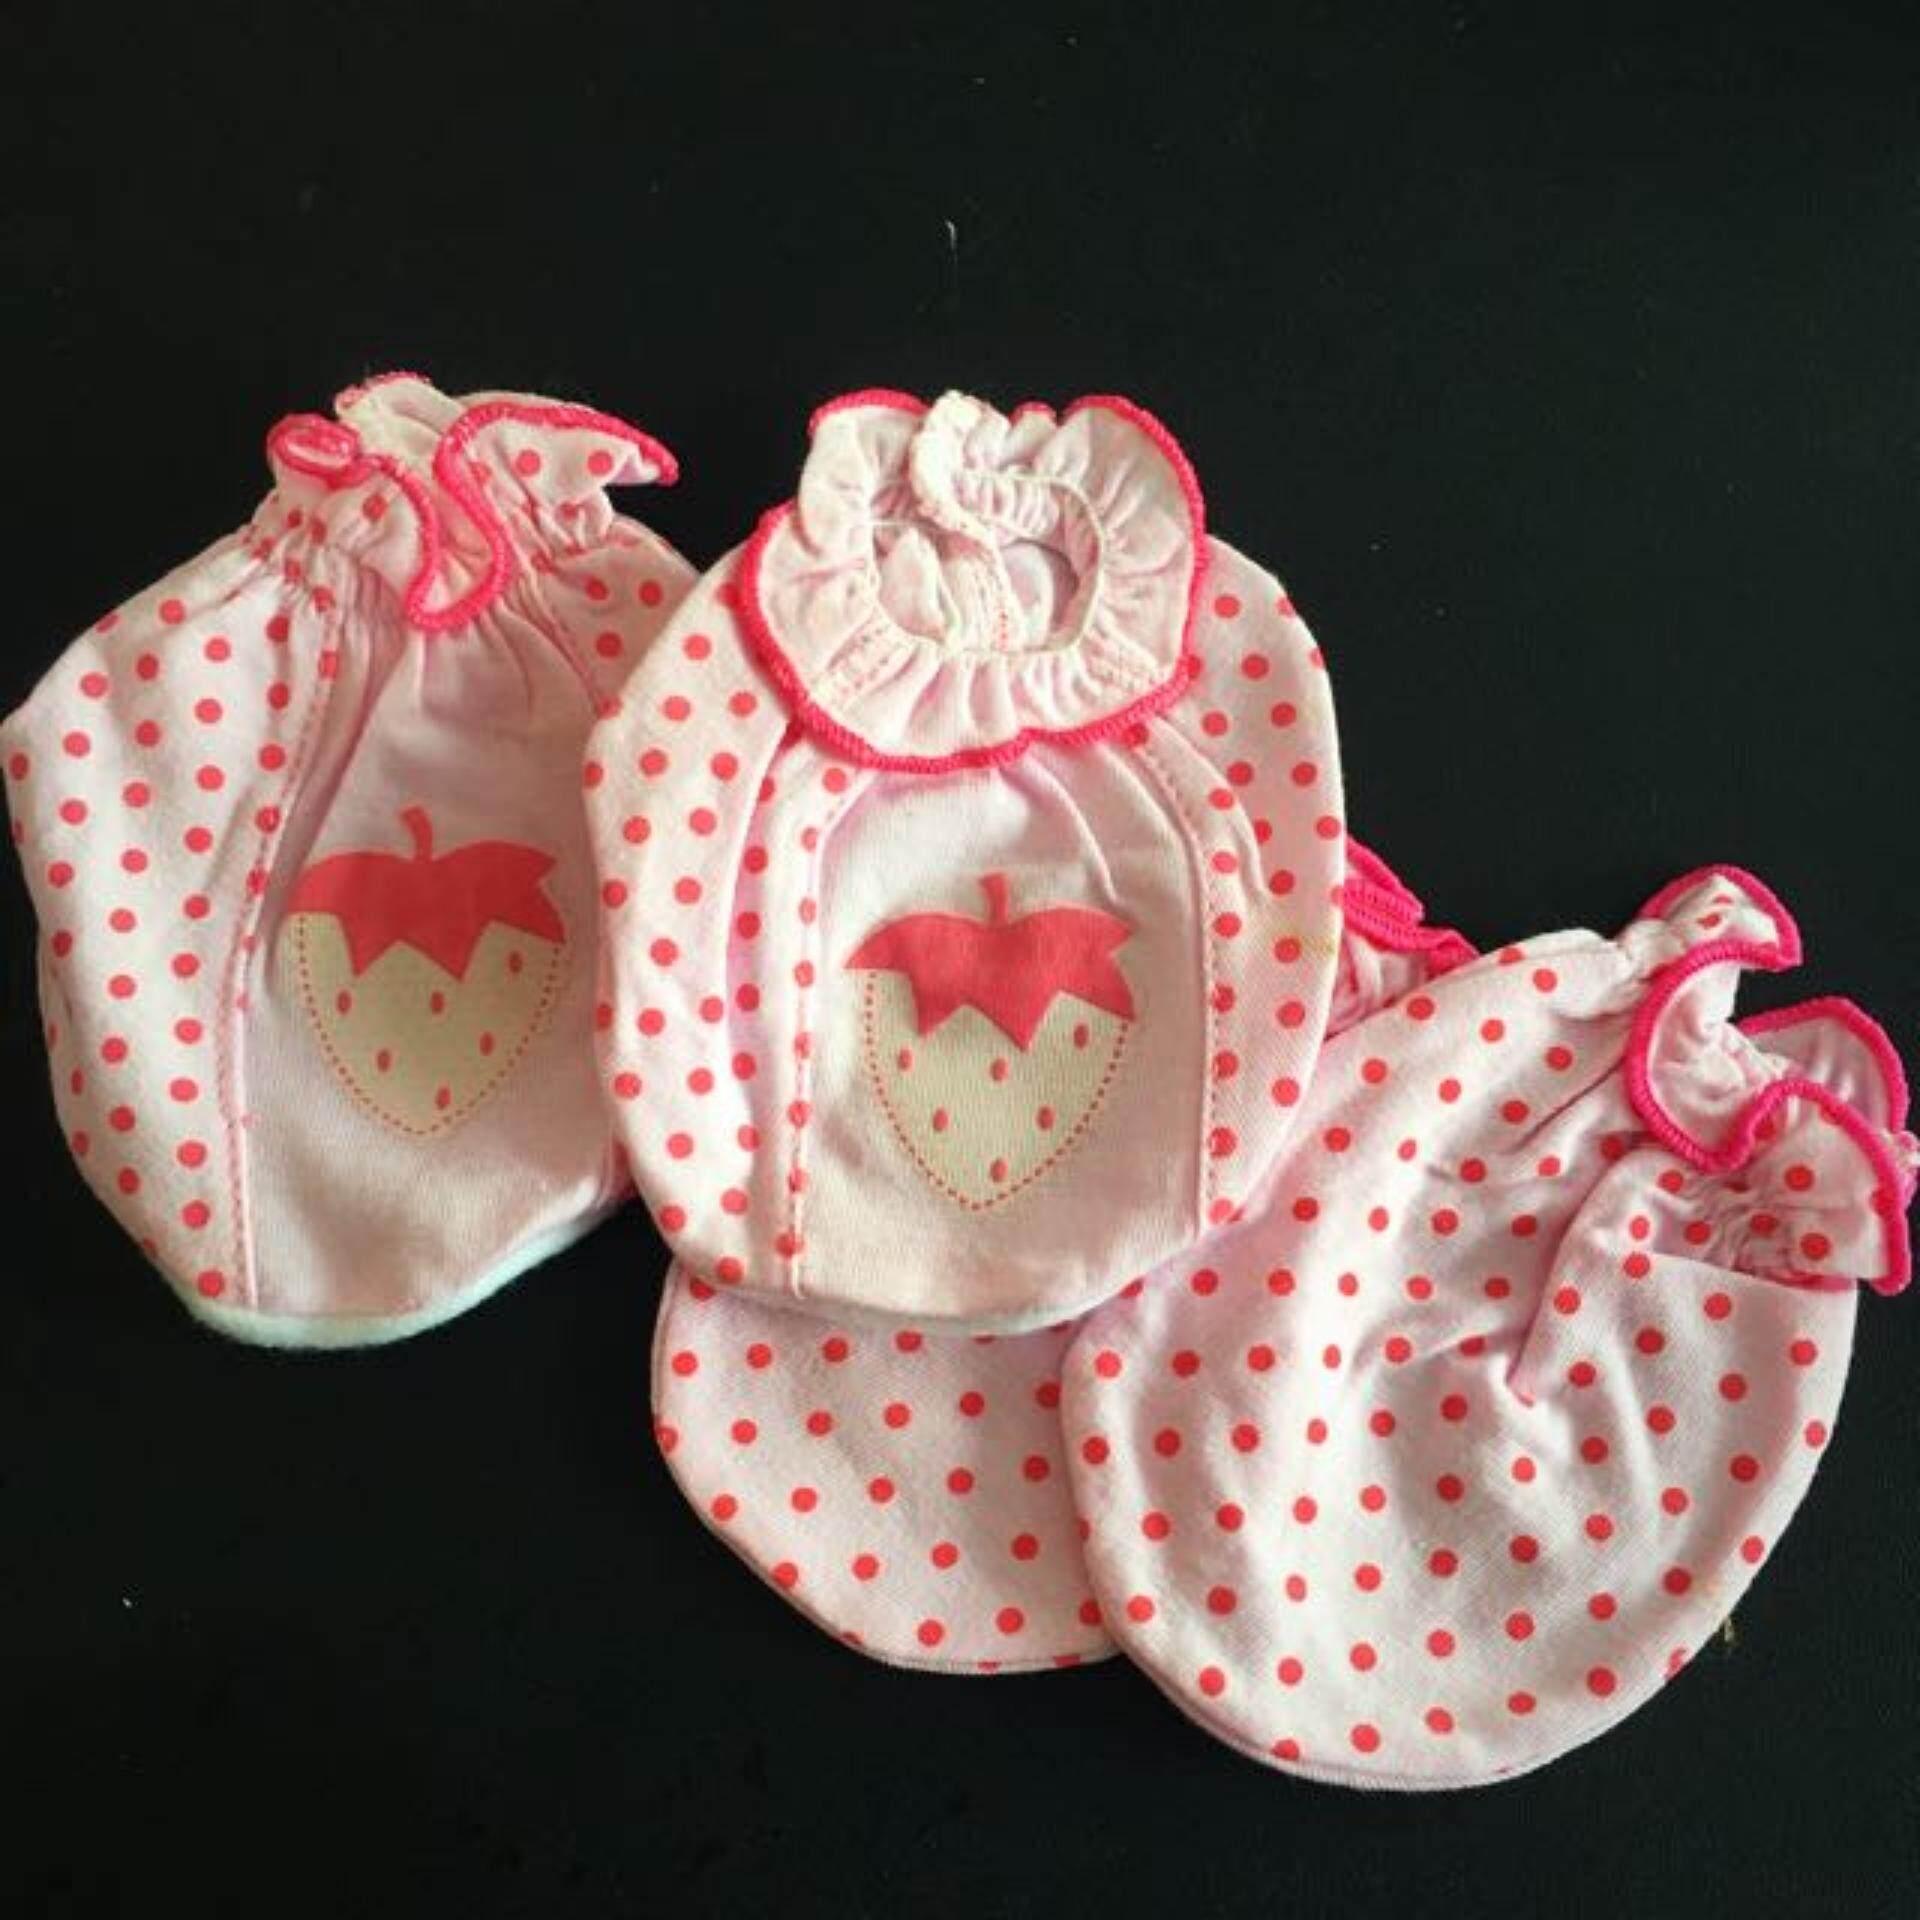 Buying Iq Baby Strawberry Teether Gigitan Bayi Moif Gigtan Air Girl Mittens Booties Pink